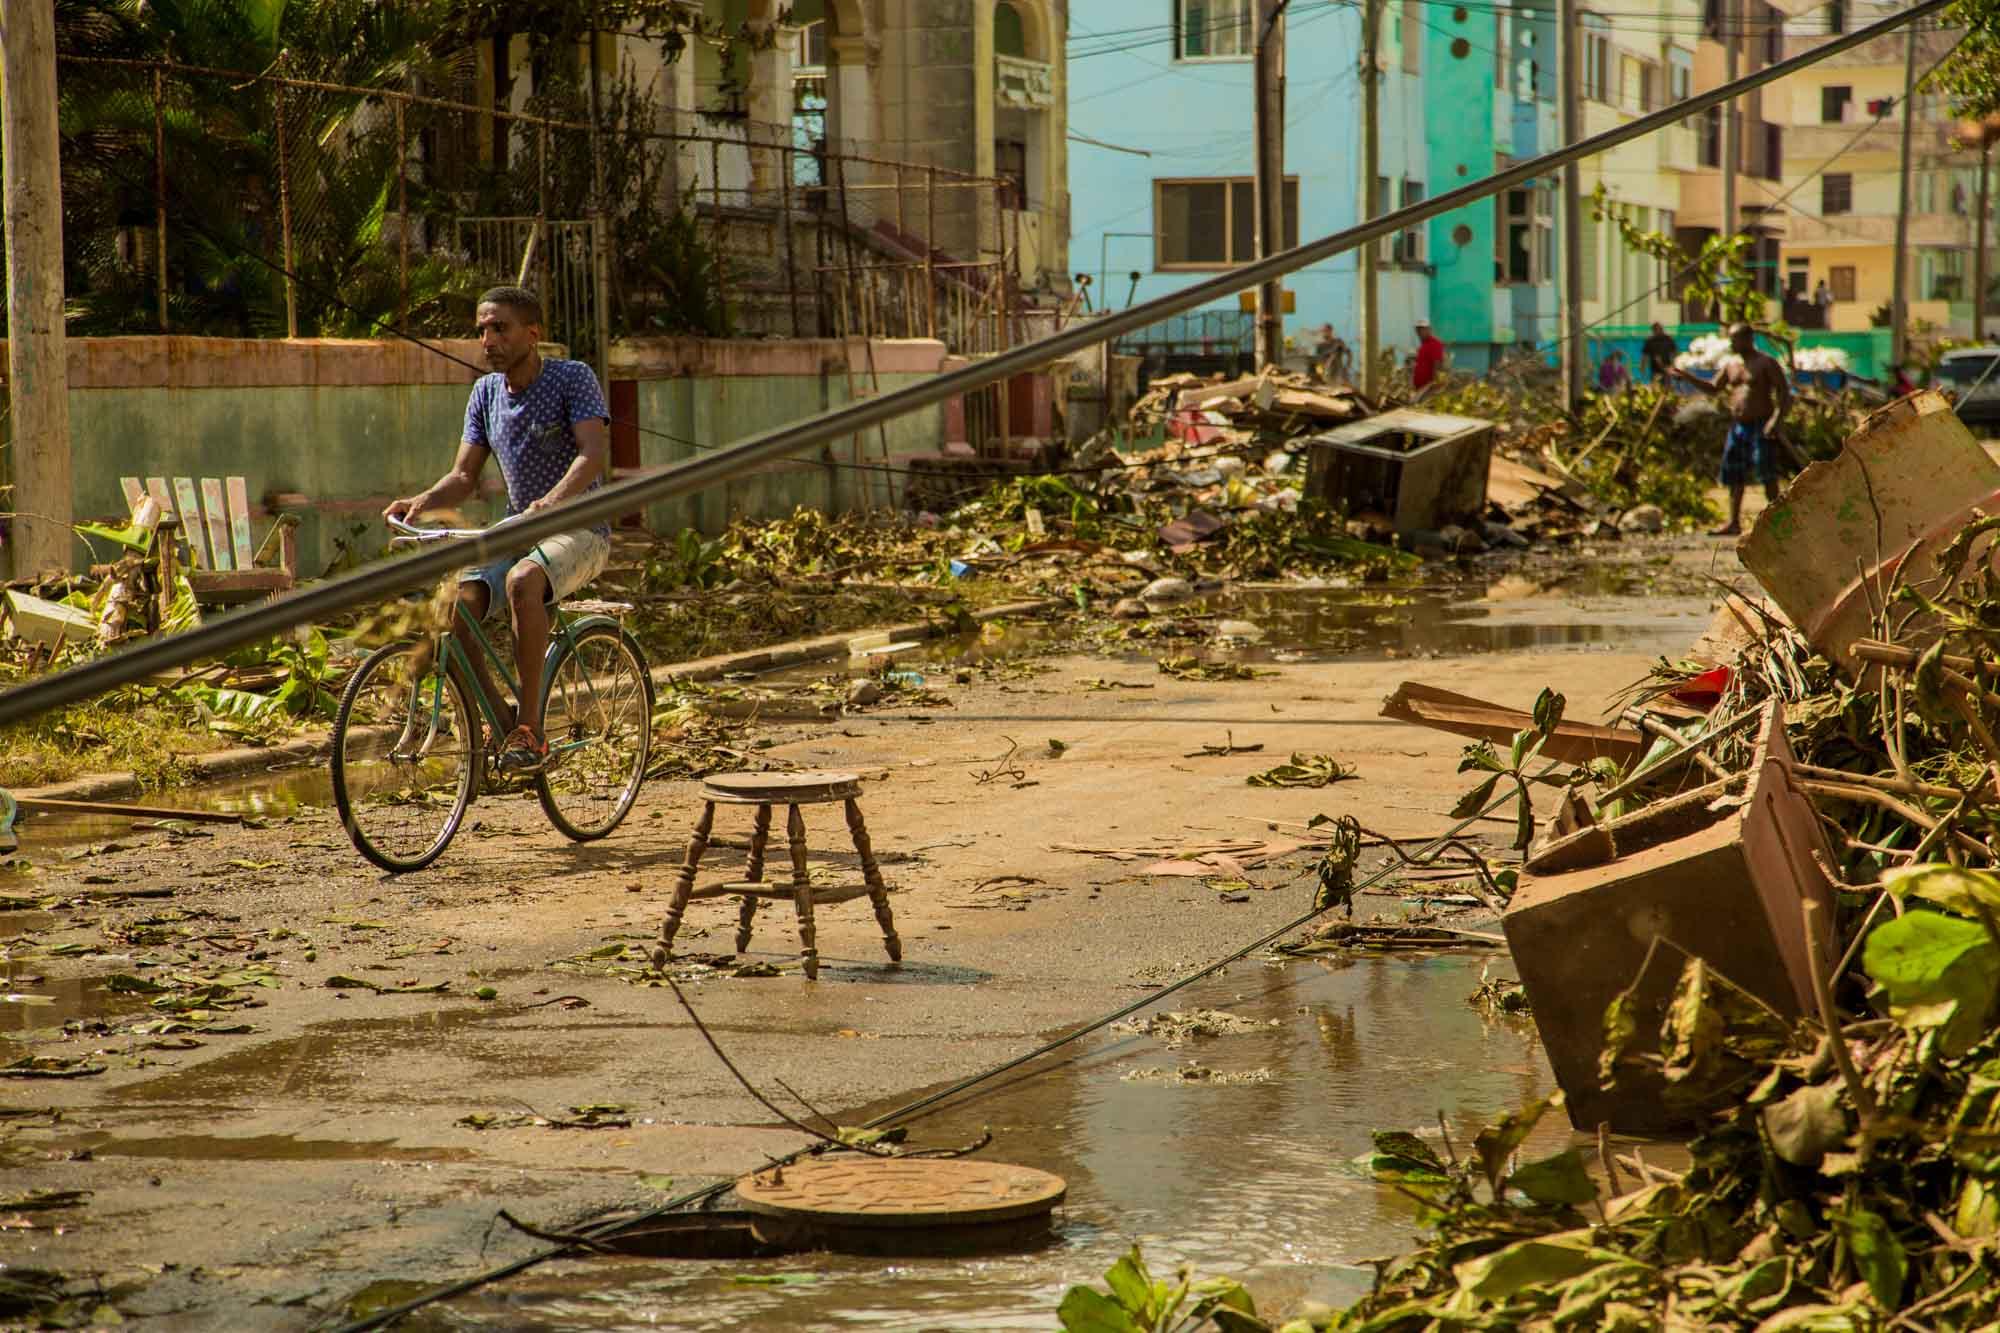 La calle L arruinada por las aguas (Foto: Jorge Ricardo)